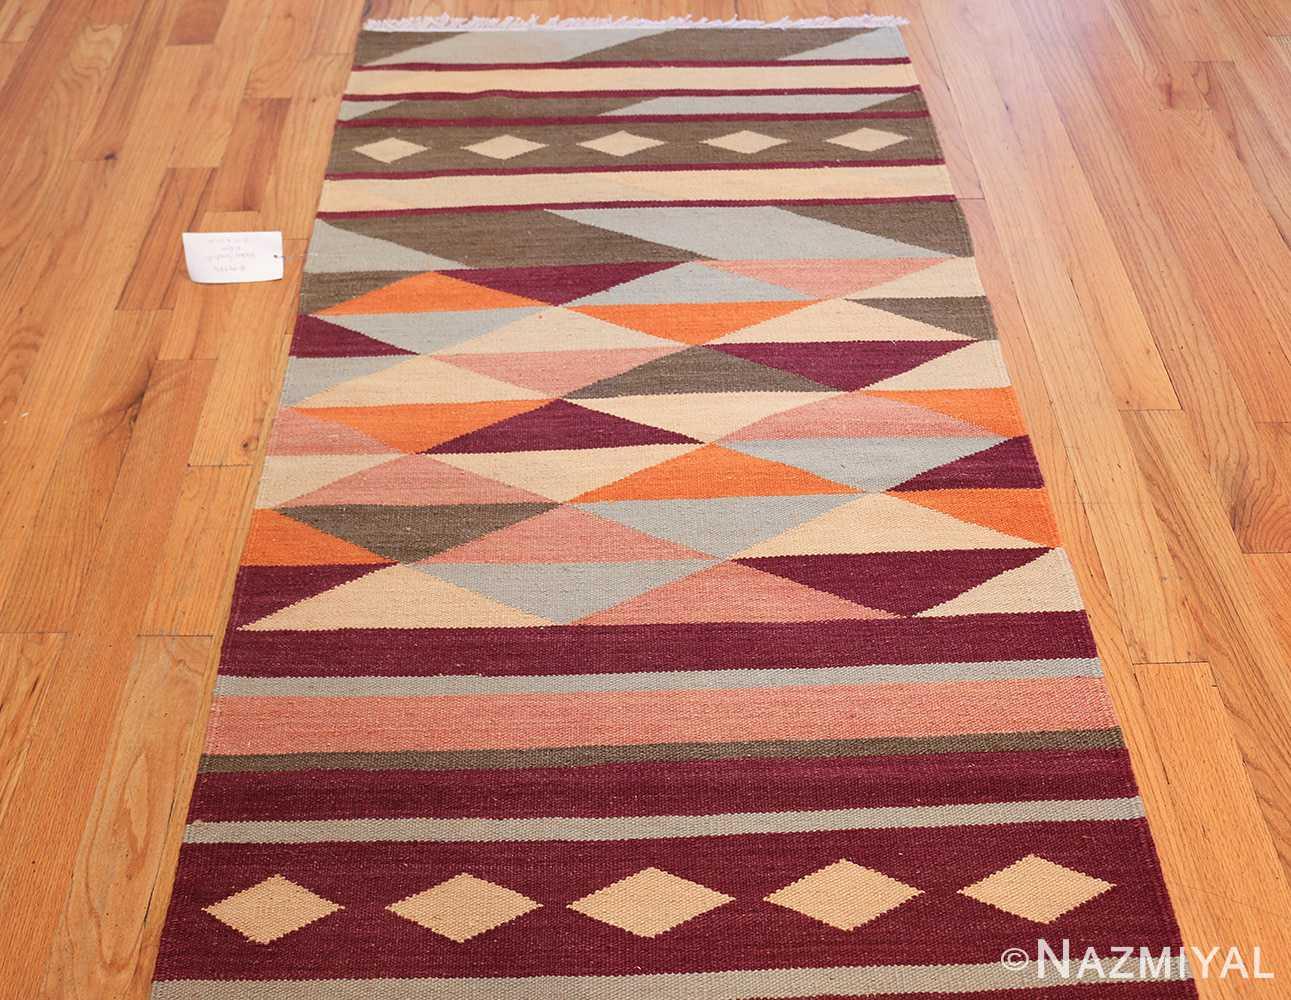 swedish scandinavian inspired modern kilim runner rug 48475 top Nazmiyal